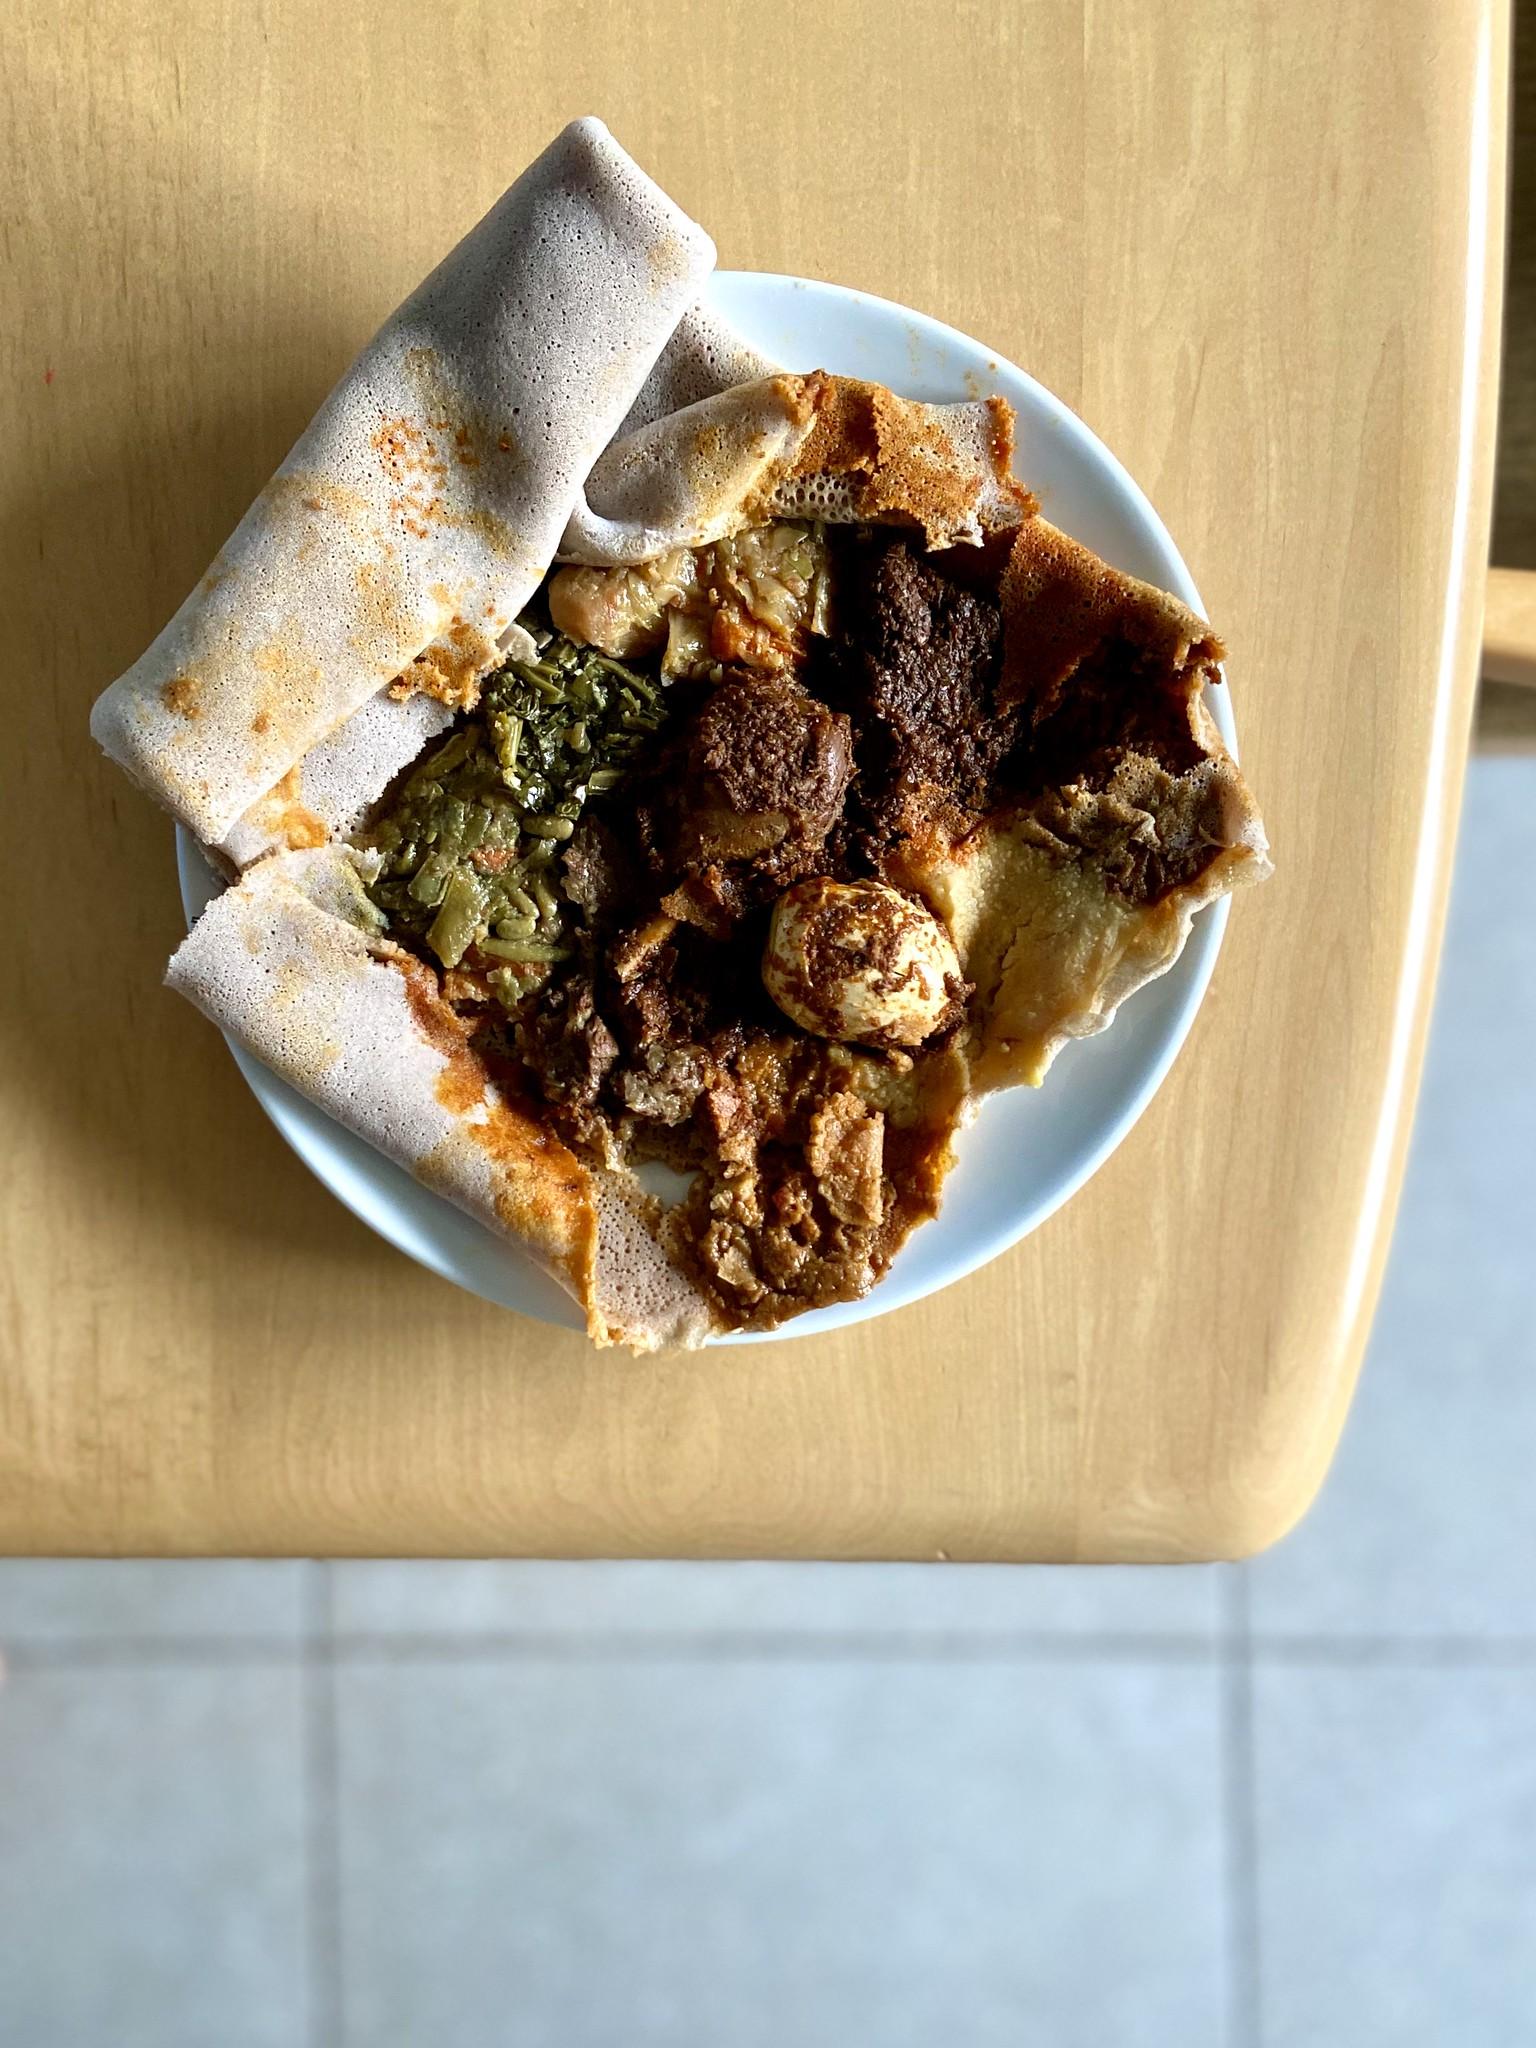 Awash Sampler - Awash Ethiopian Restaurant